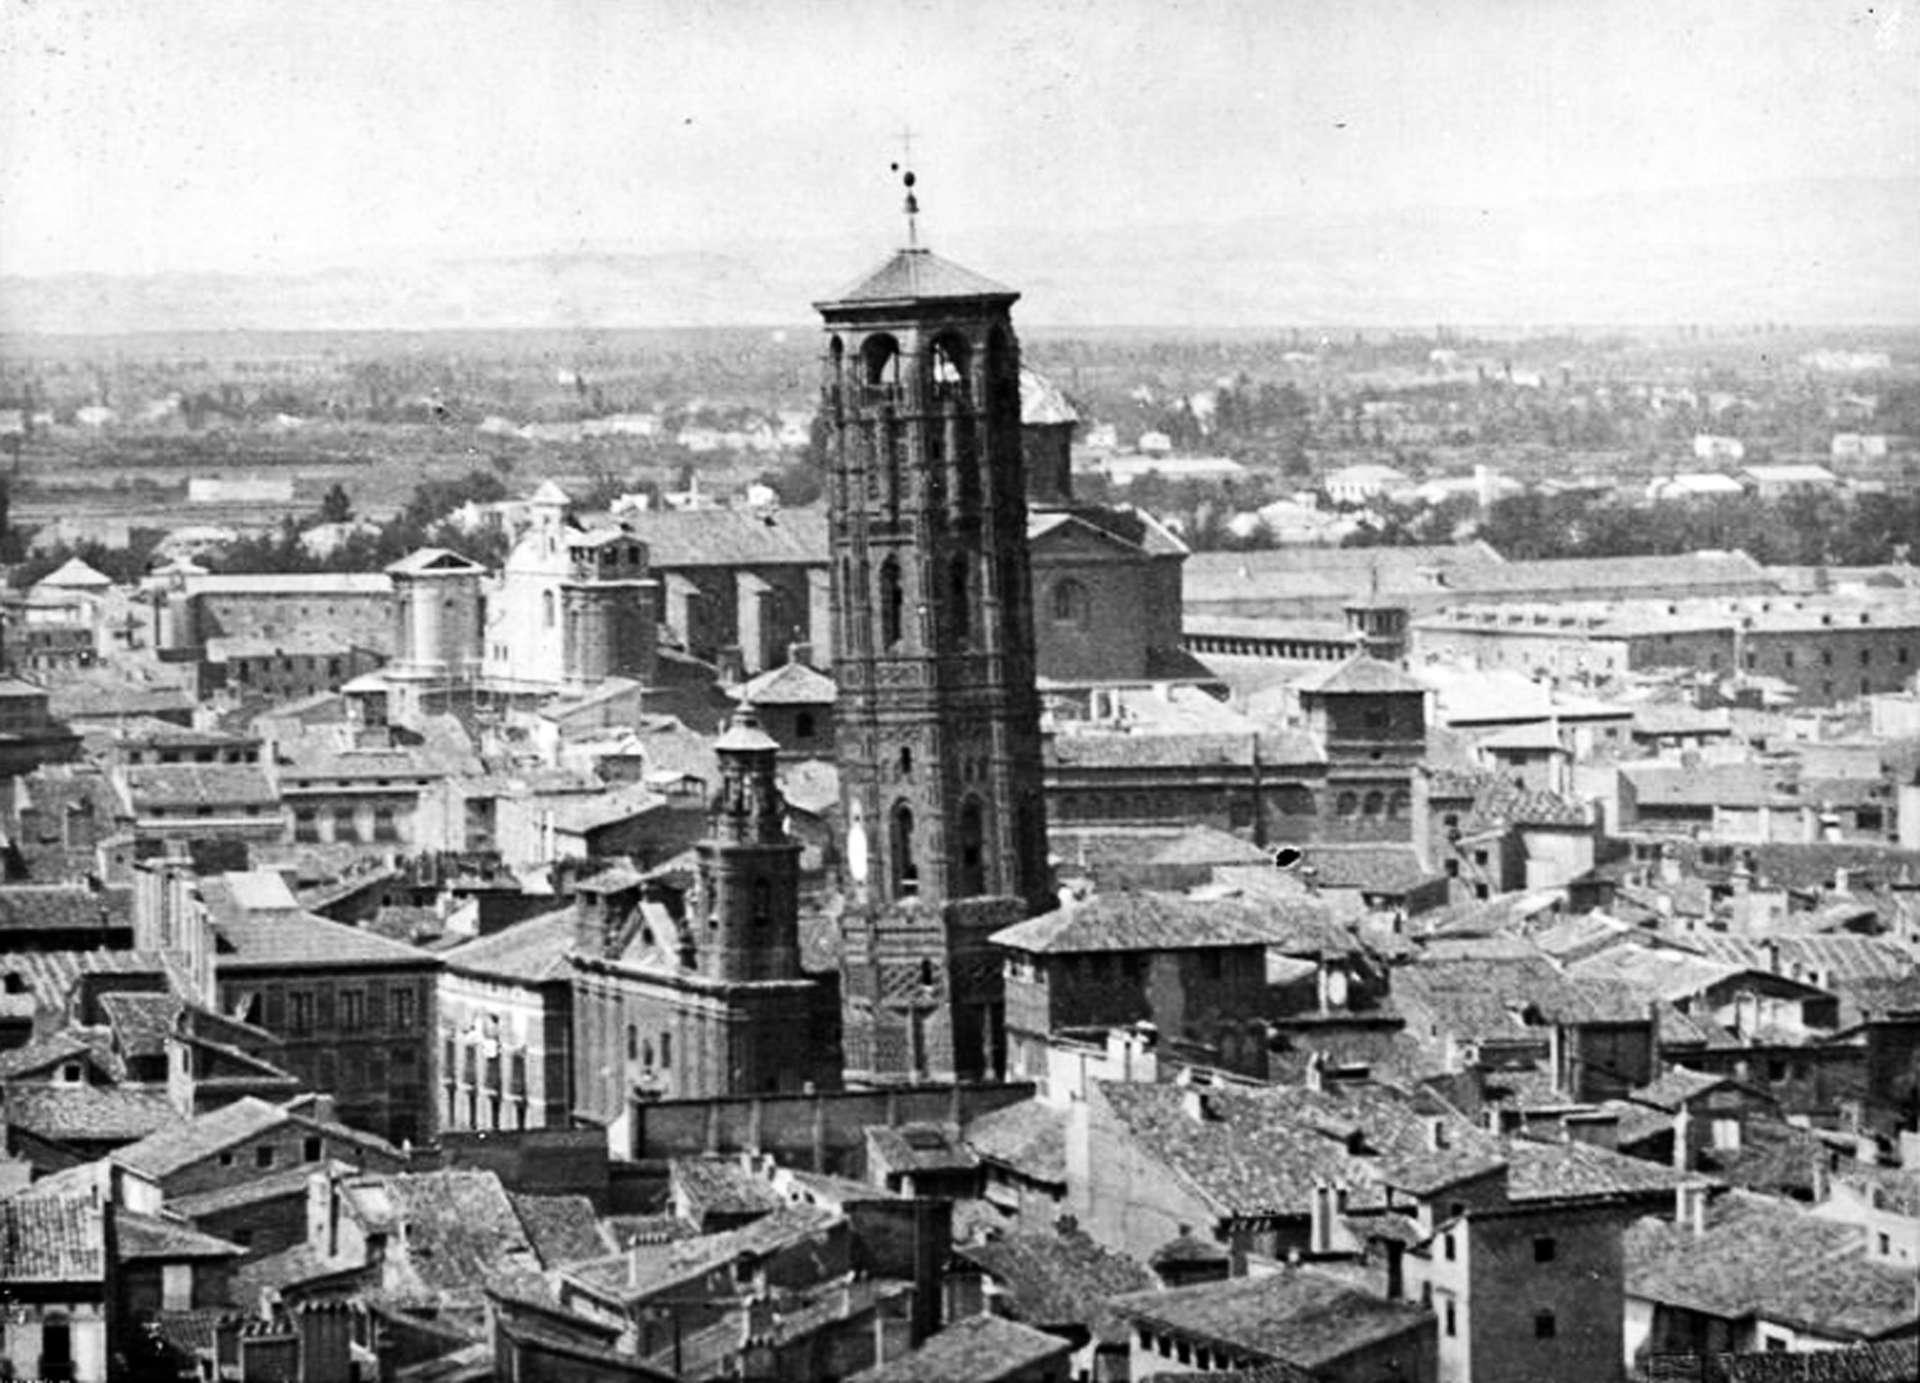 Foto de Archivo Histórico de la Provincia de Zaragoza - Estudio Coyne - 1892 - Vista de la Torre Nueva y de la Iglesia de San Felipe